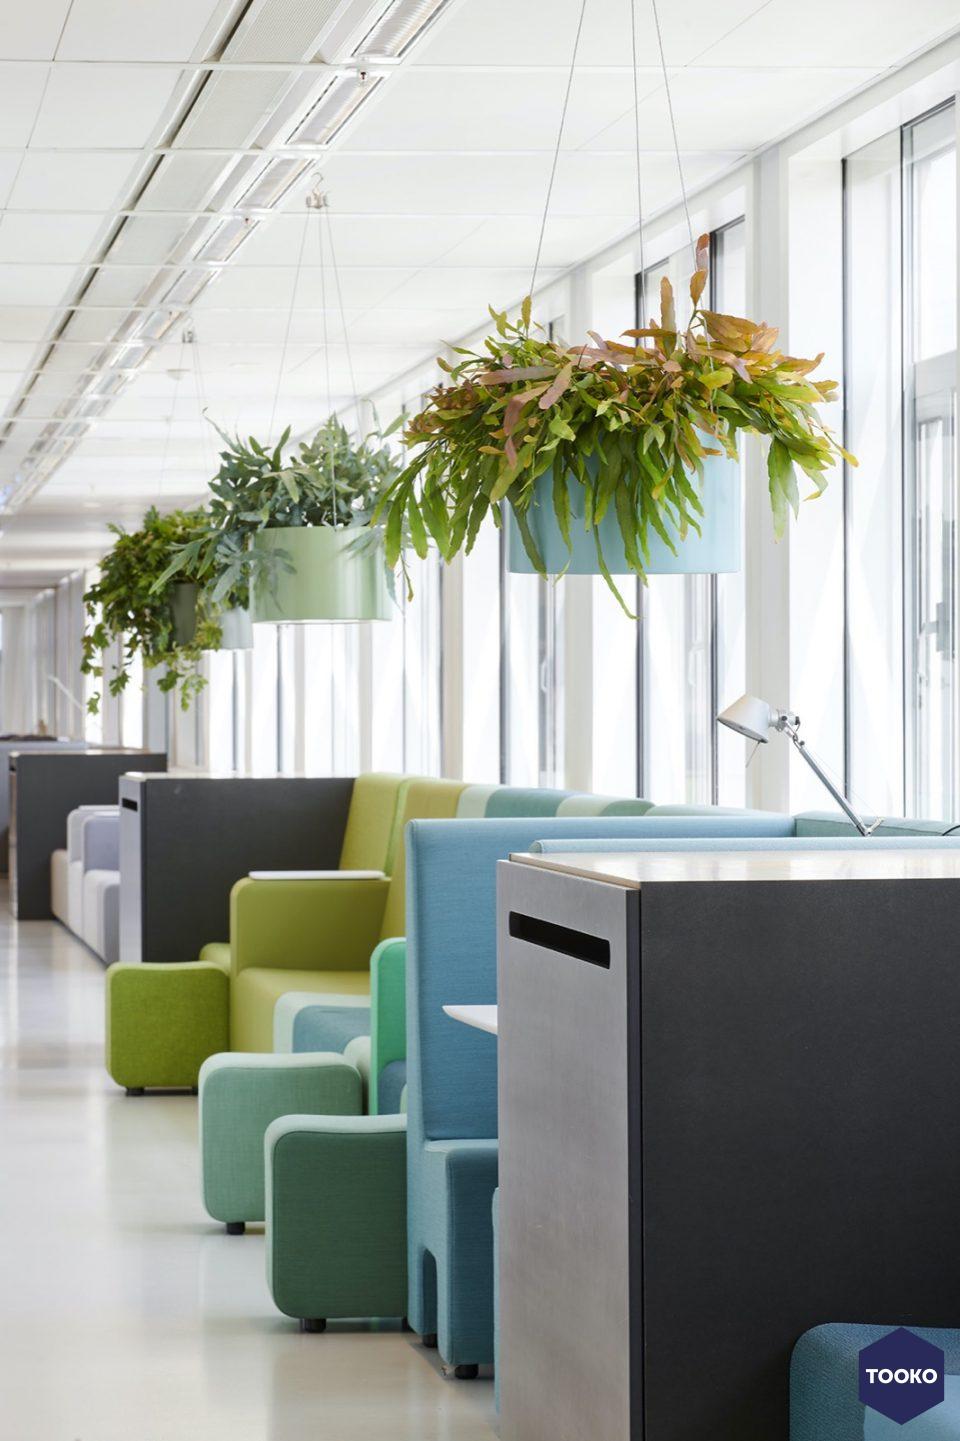 Interieurbeplanting De Klerk - Productielijn Plantinum Colourful